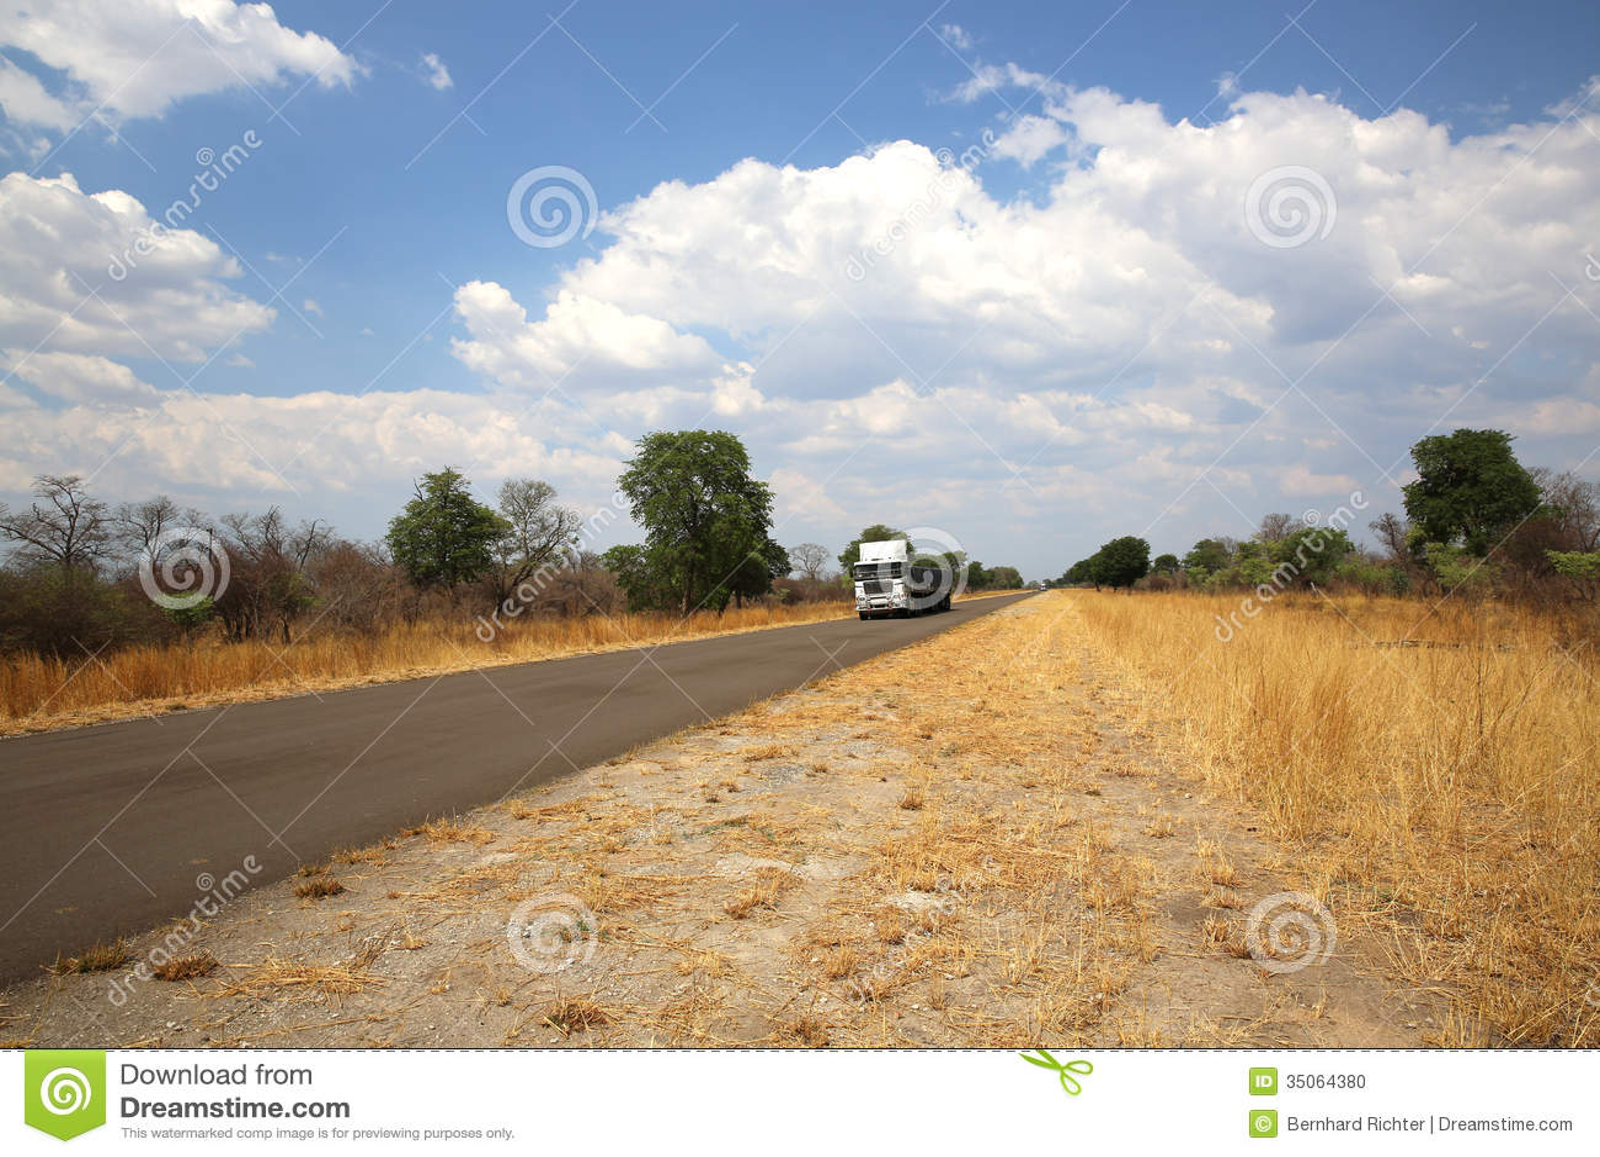 Katima Mulilo Namibia  City pictures : Truck near Katima Mulilo at the Caprivi Strip. Namibia.